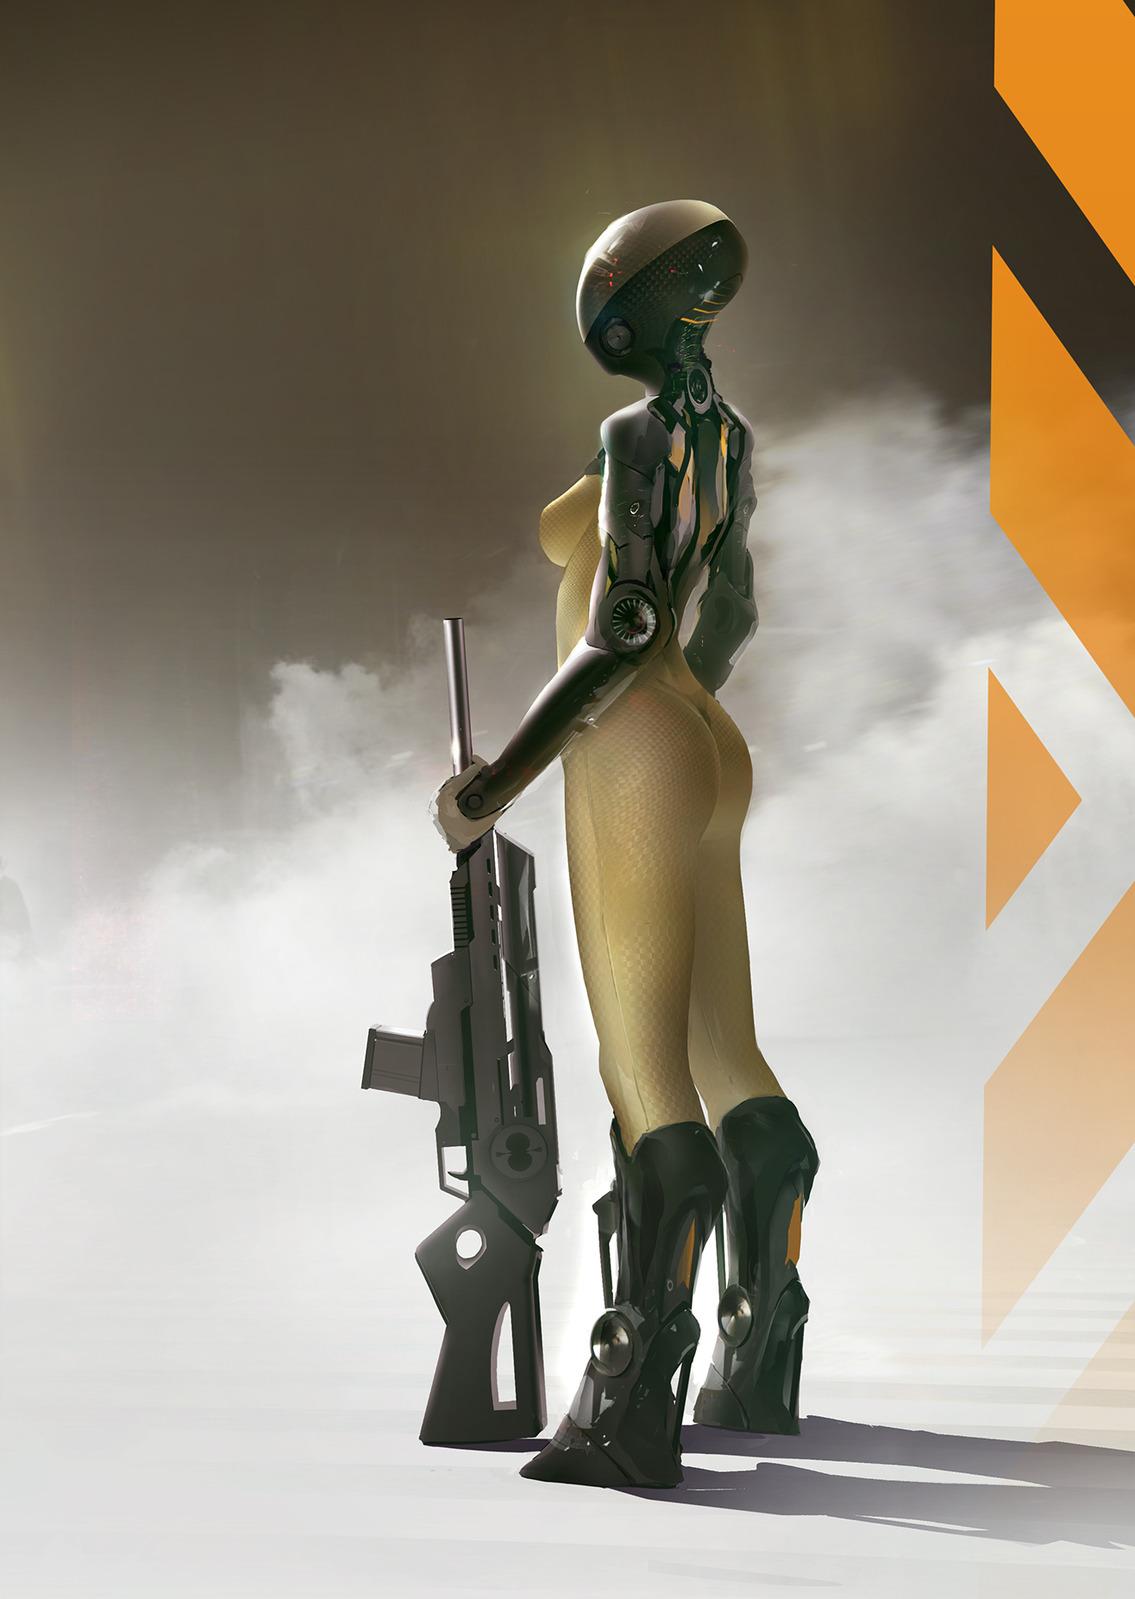 Nicolas Ferrand Sci-Fi Artist | Artwork by Video Game